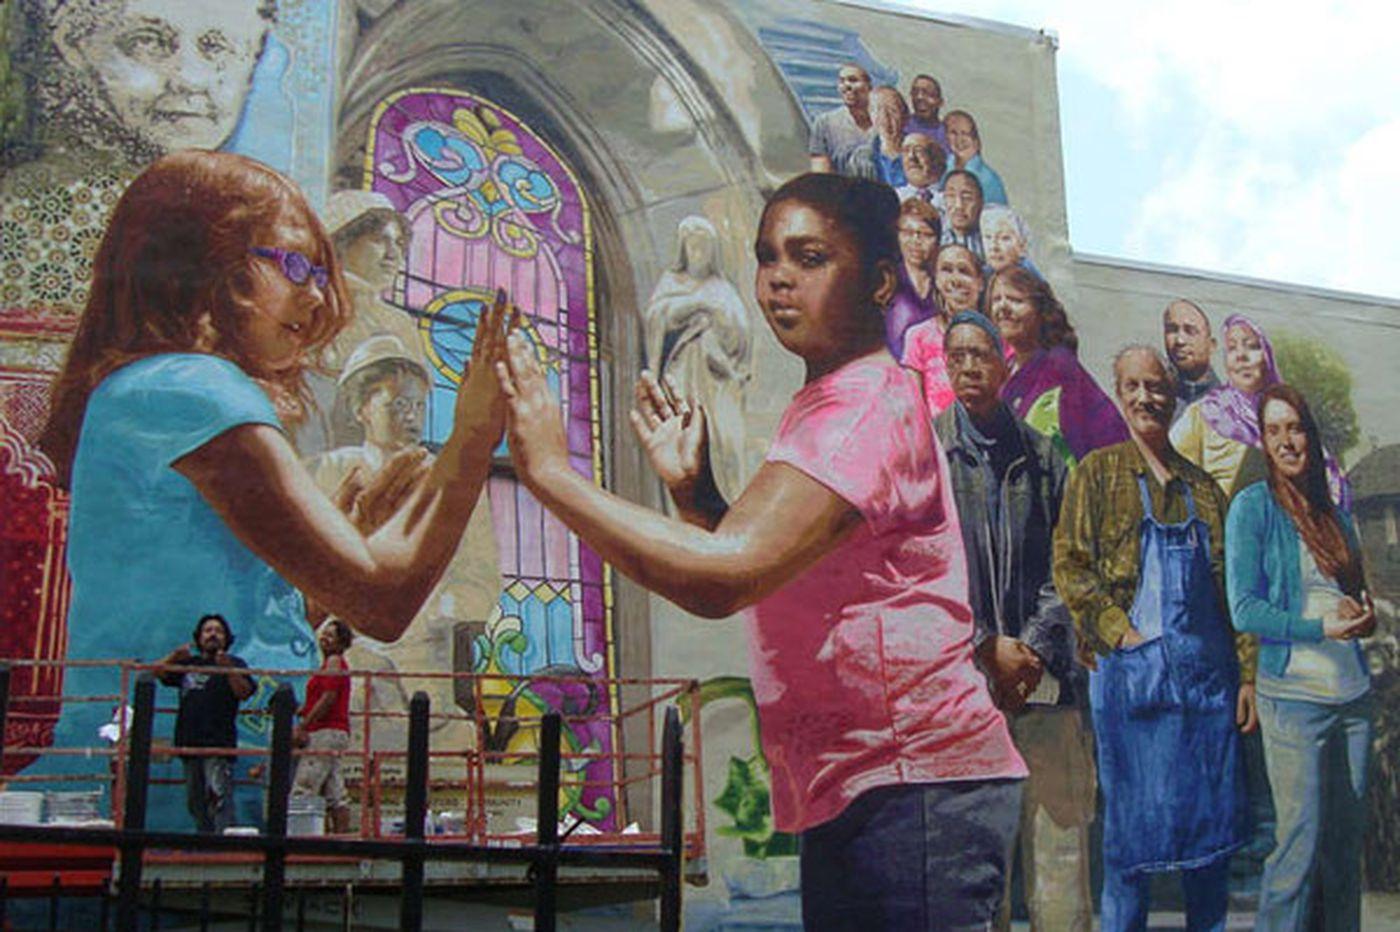 Murals exhibit new life along Frankford Avenue